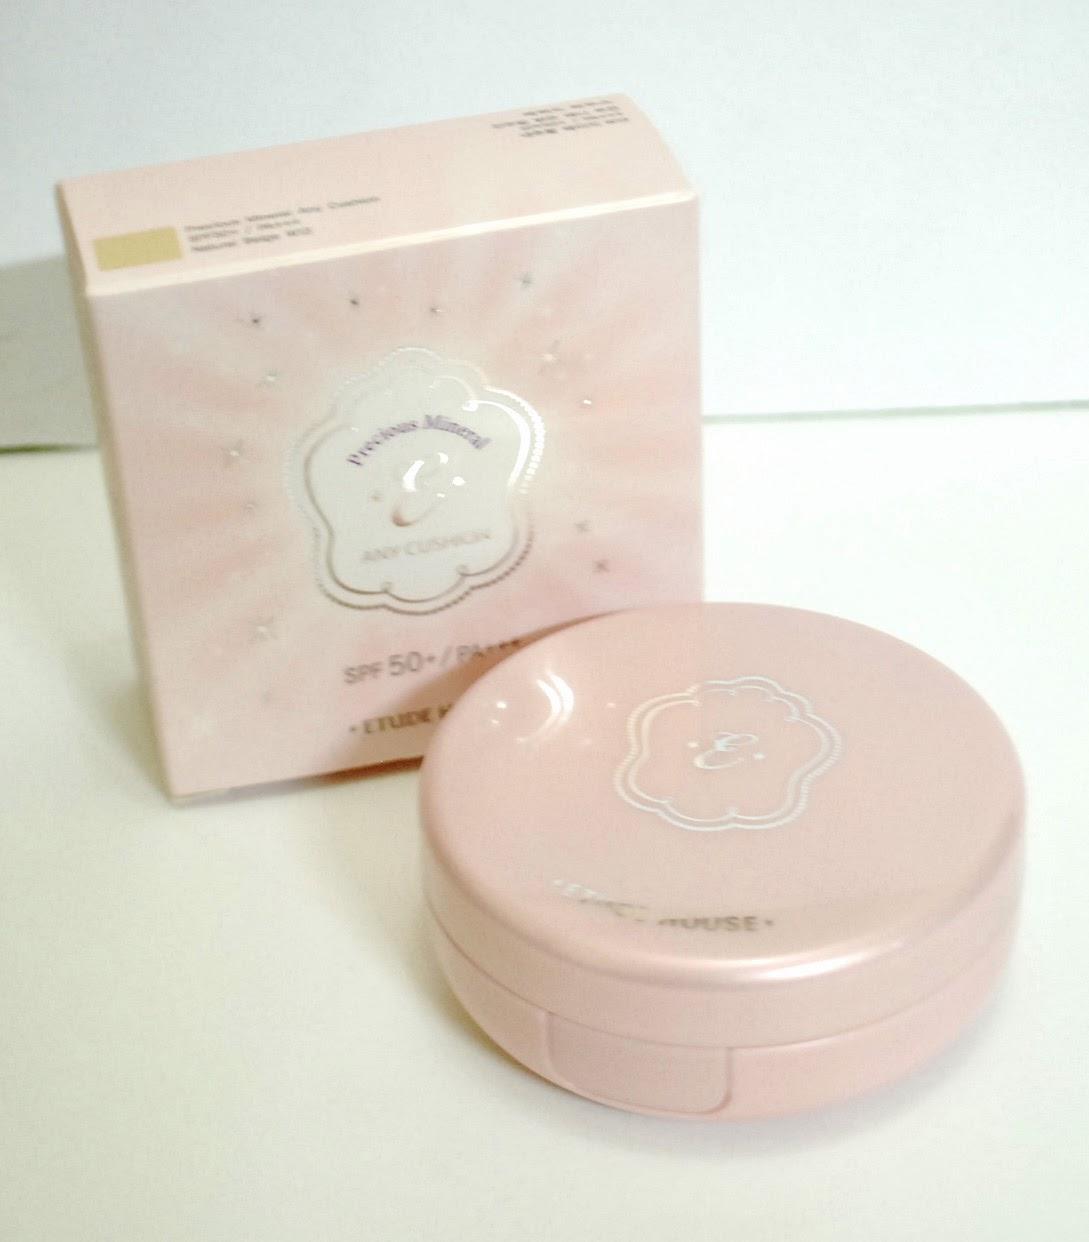 Bb cream for oily skin philippines price